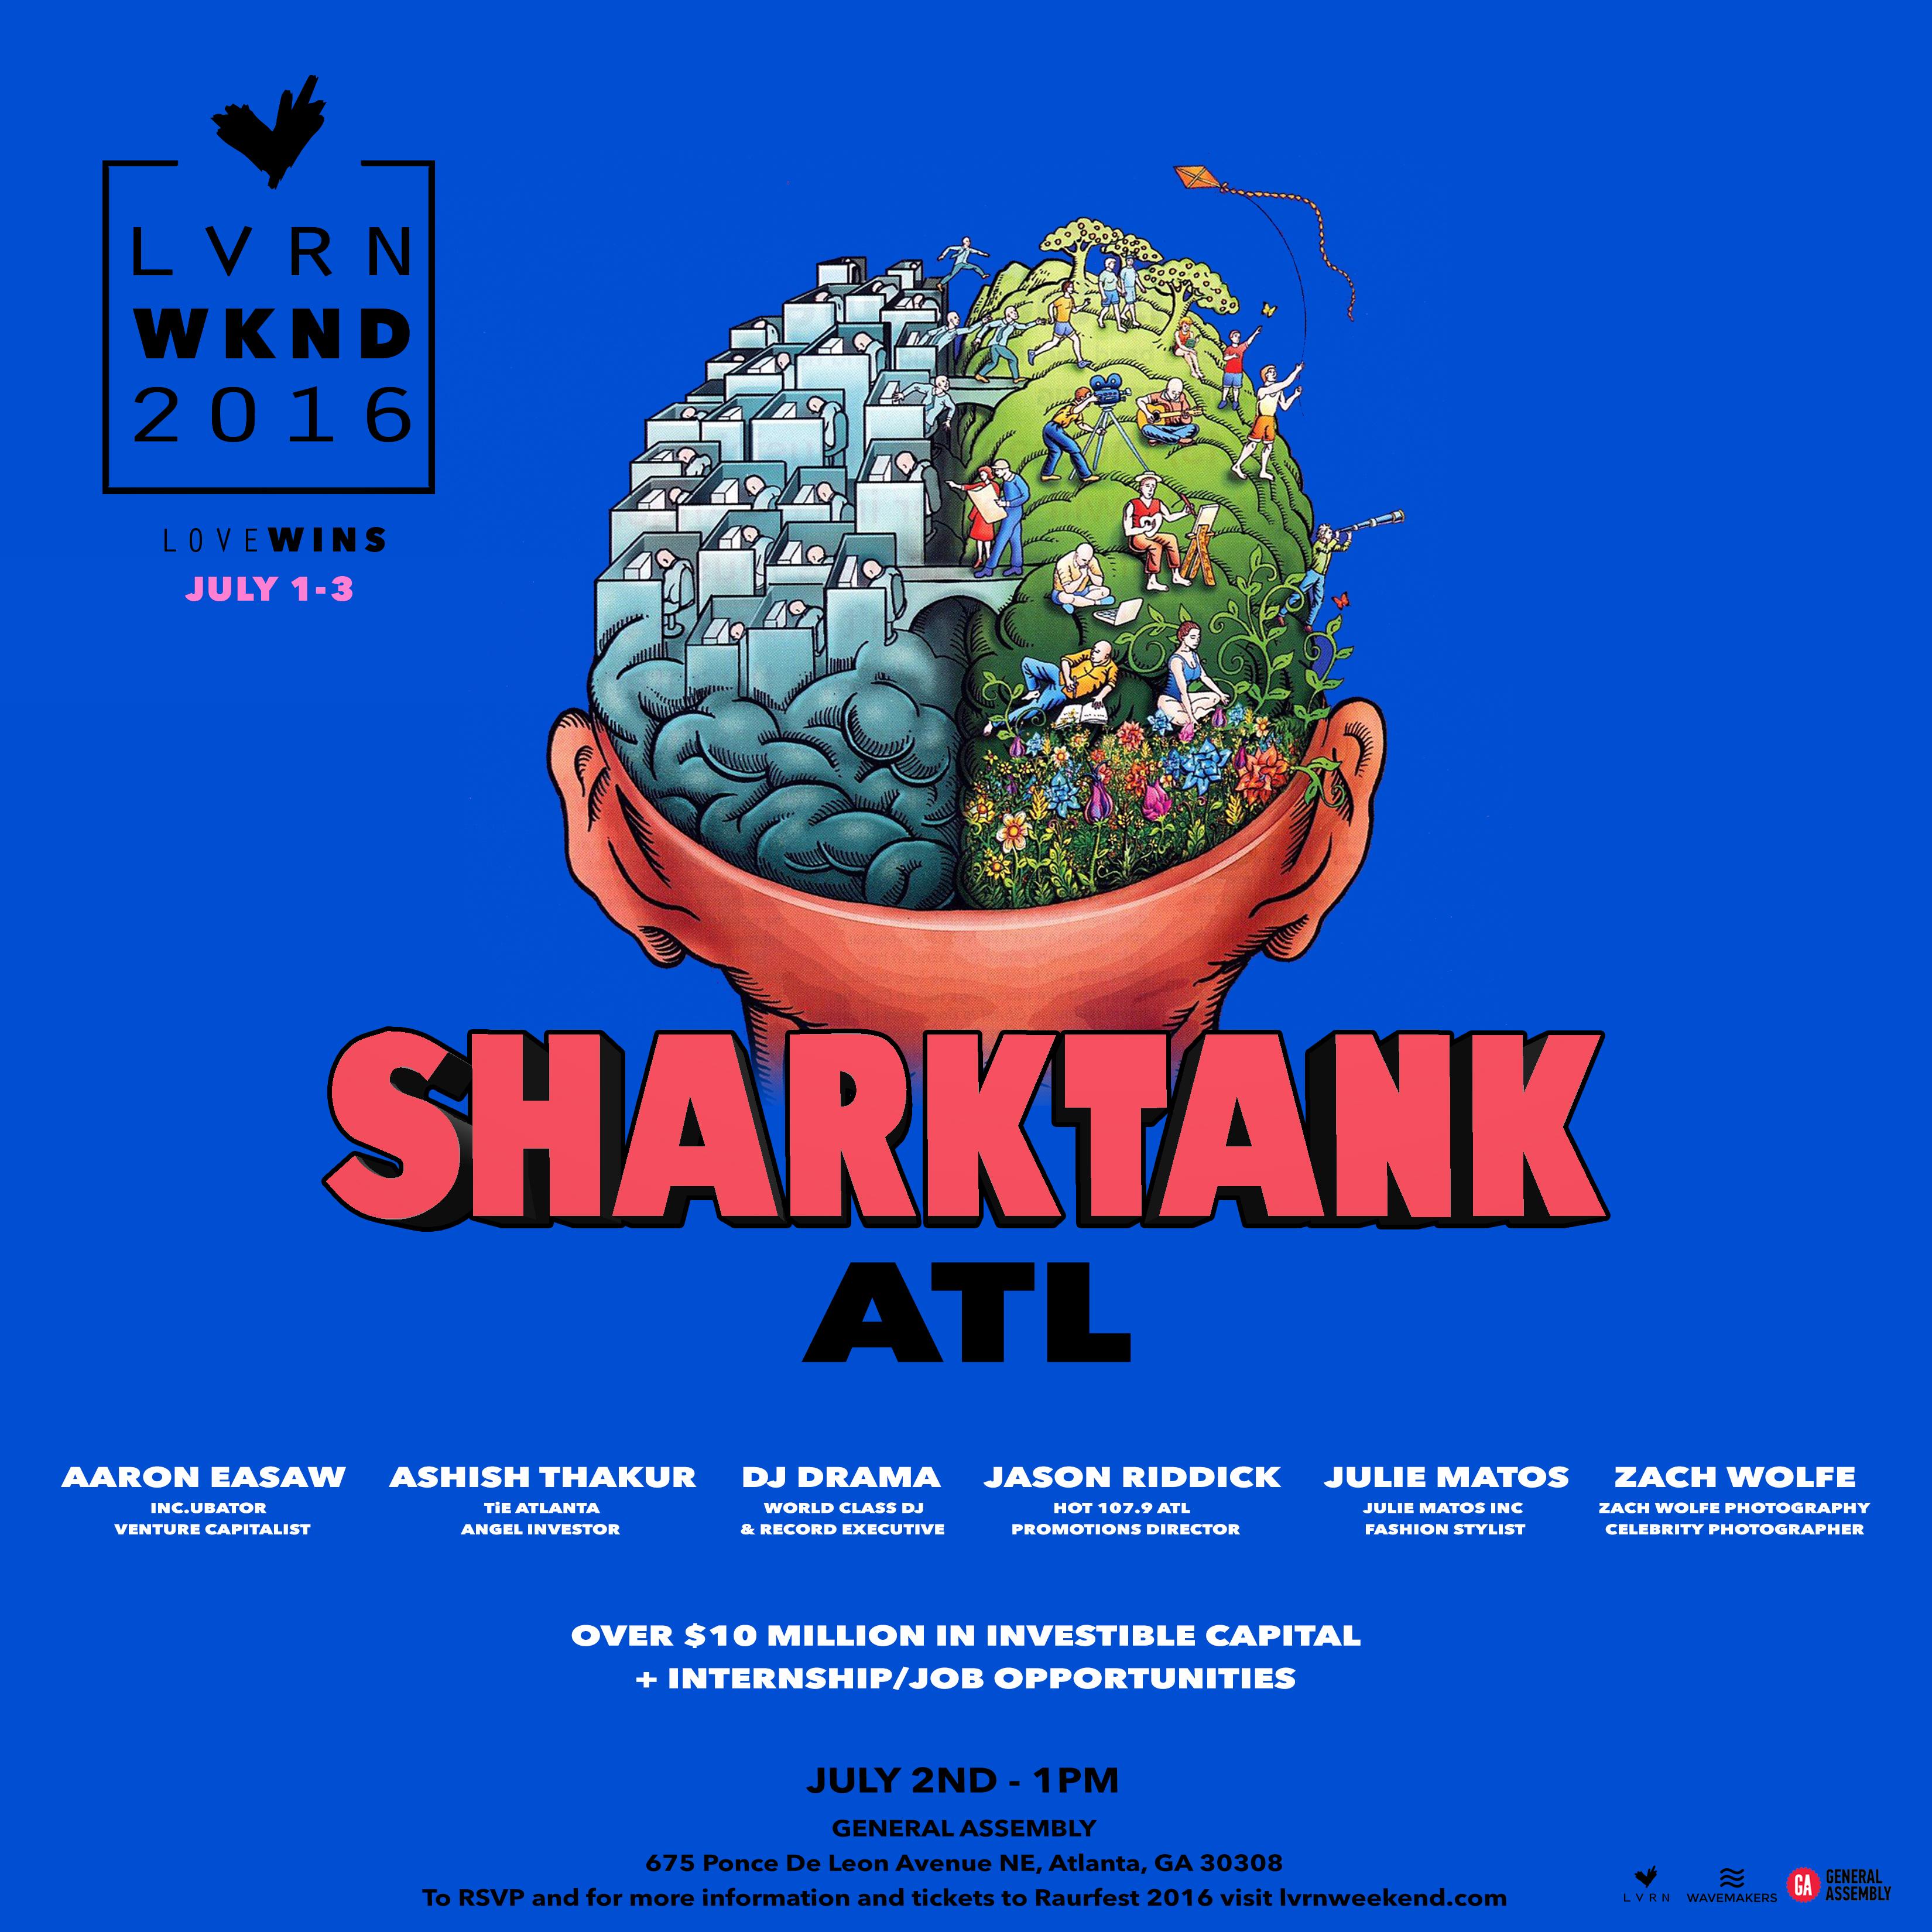 Shark Tank ATL